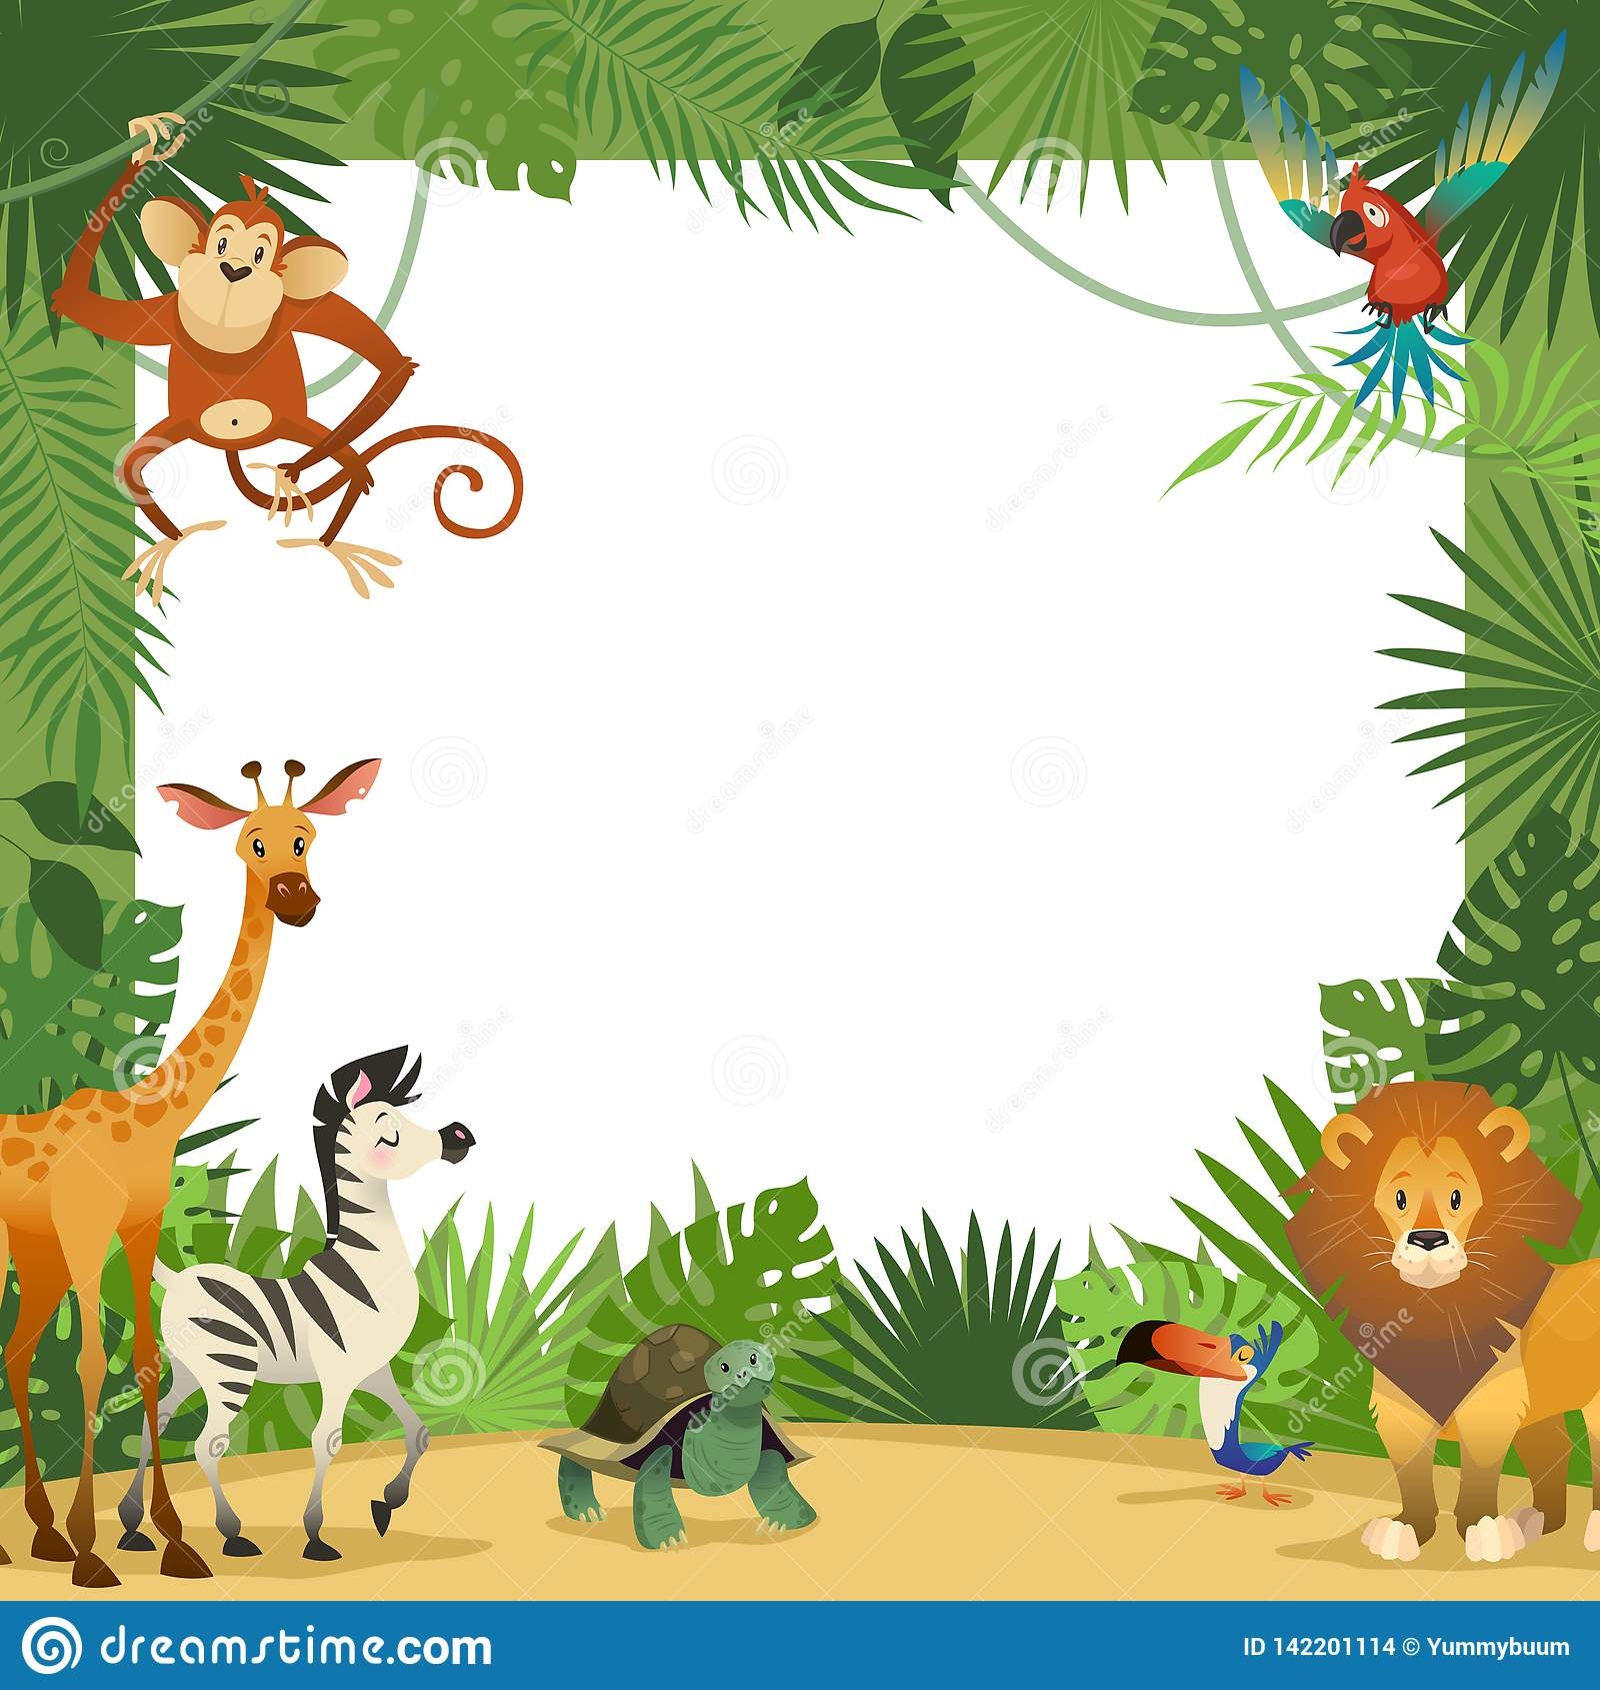 Zoo Animals Clip Art Border Zoo Border Stoc...